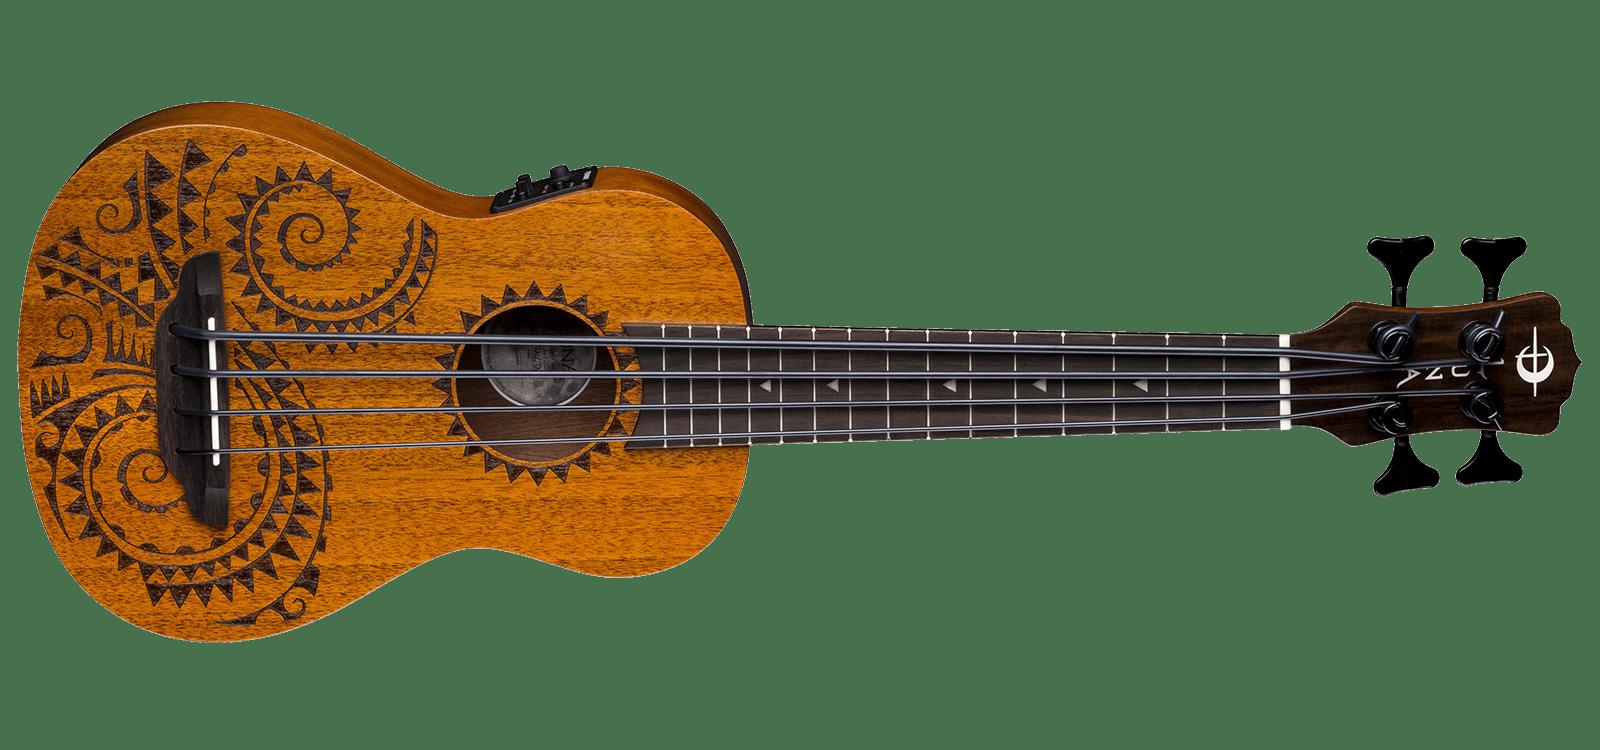 ukulele sizes shapes finding the perfect uke body shape for you. Black Bedroom Furniture Sets. Home Design Ideas